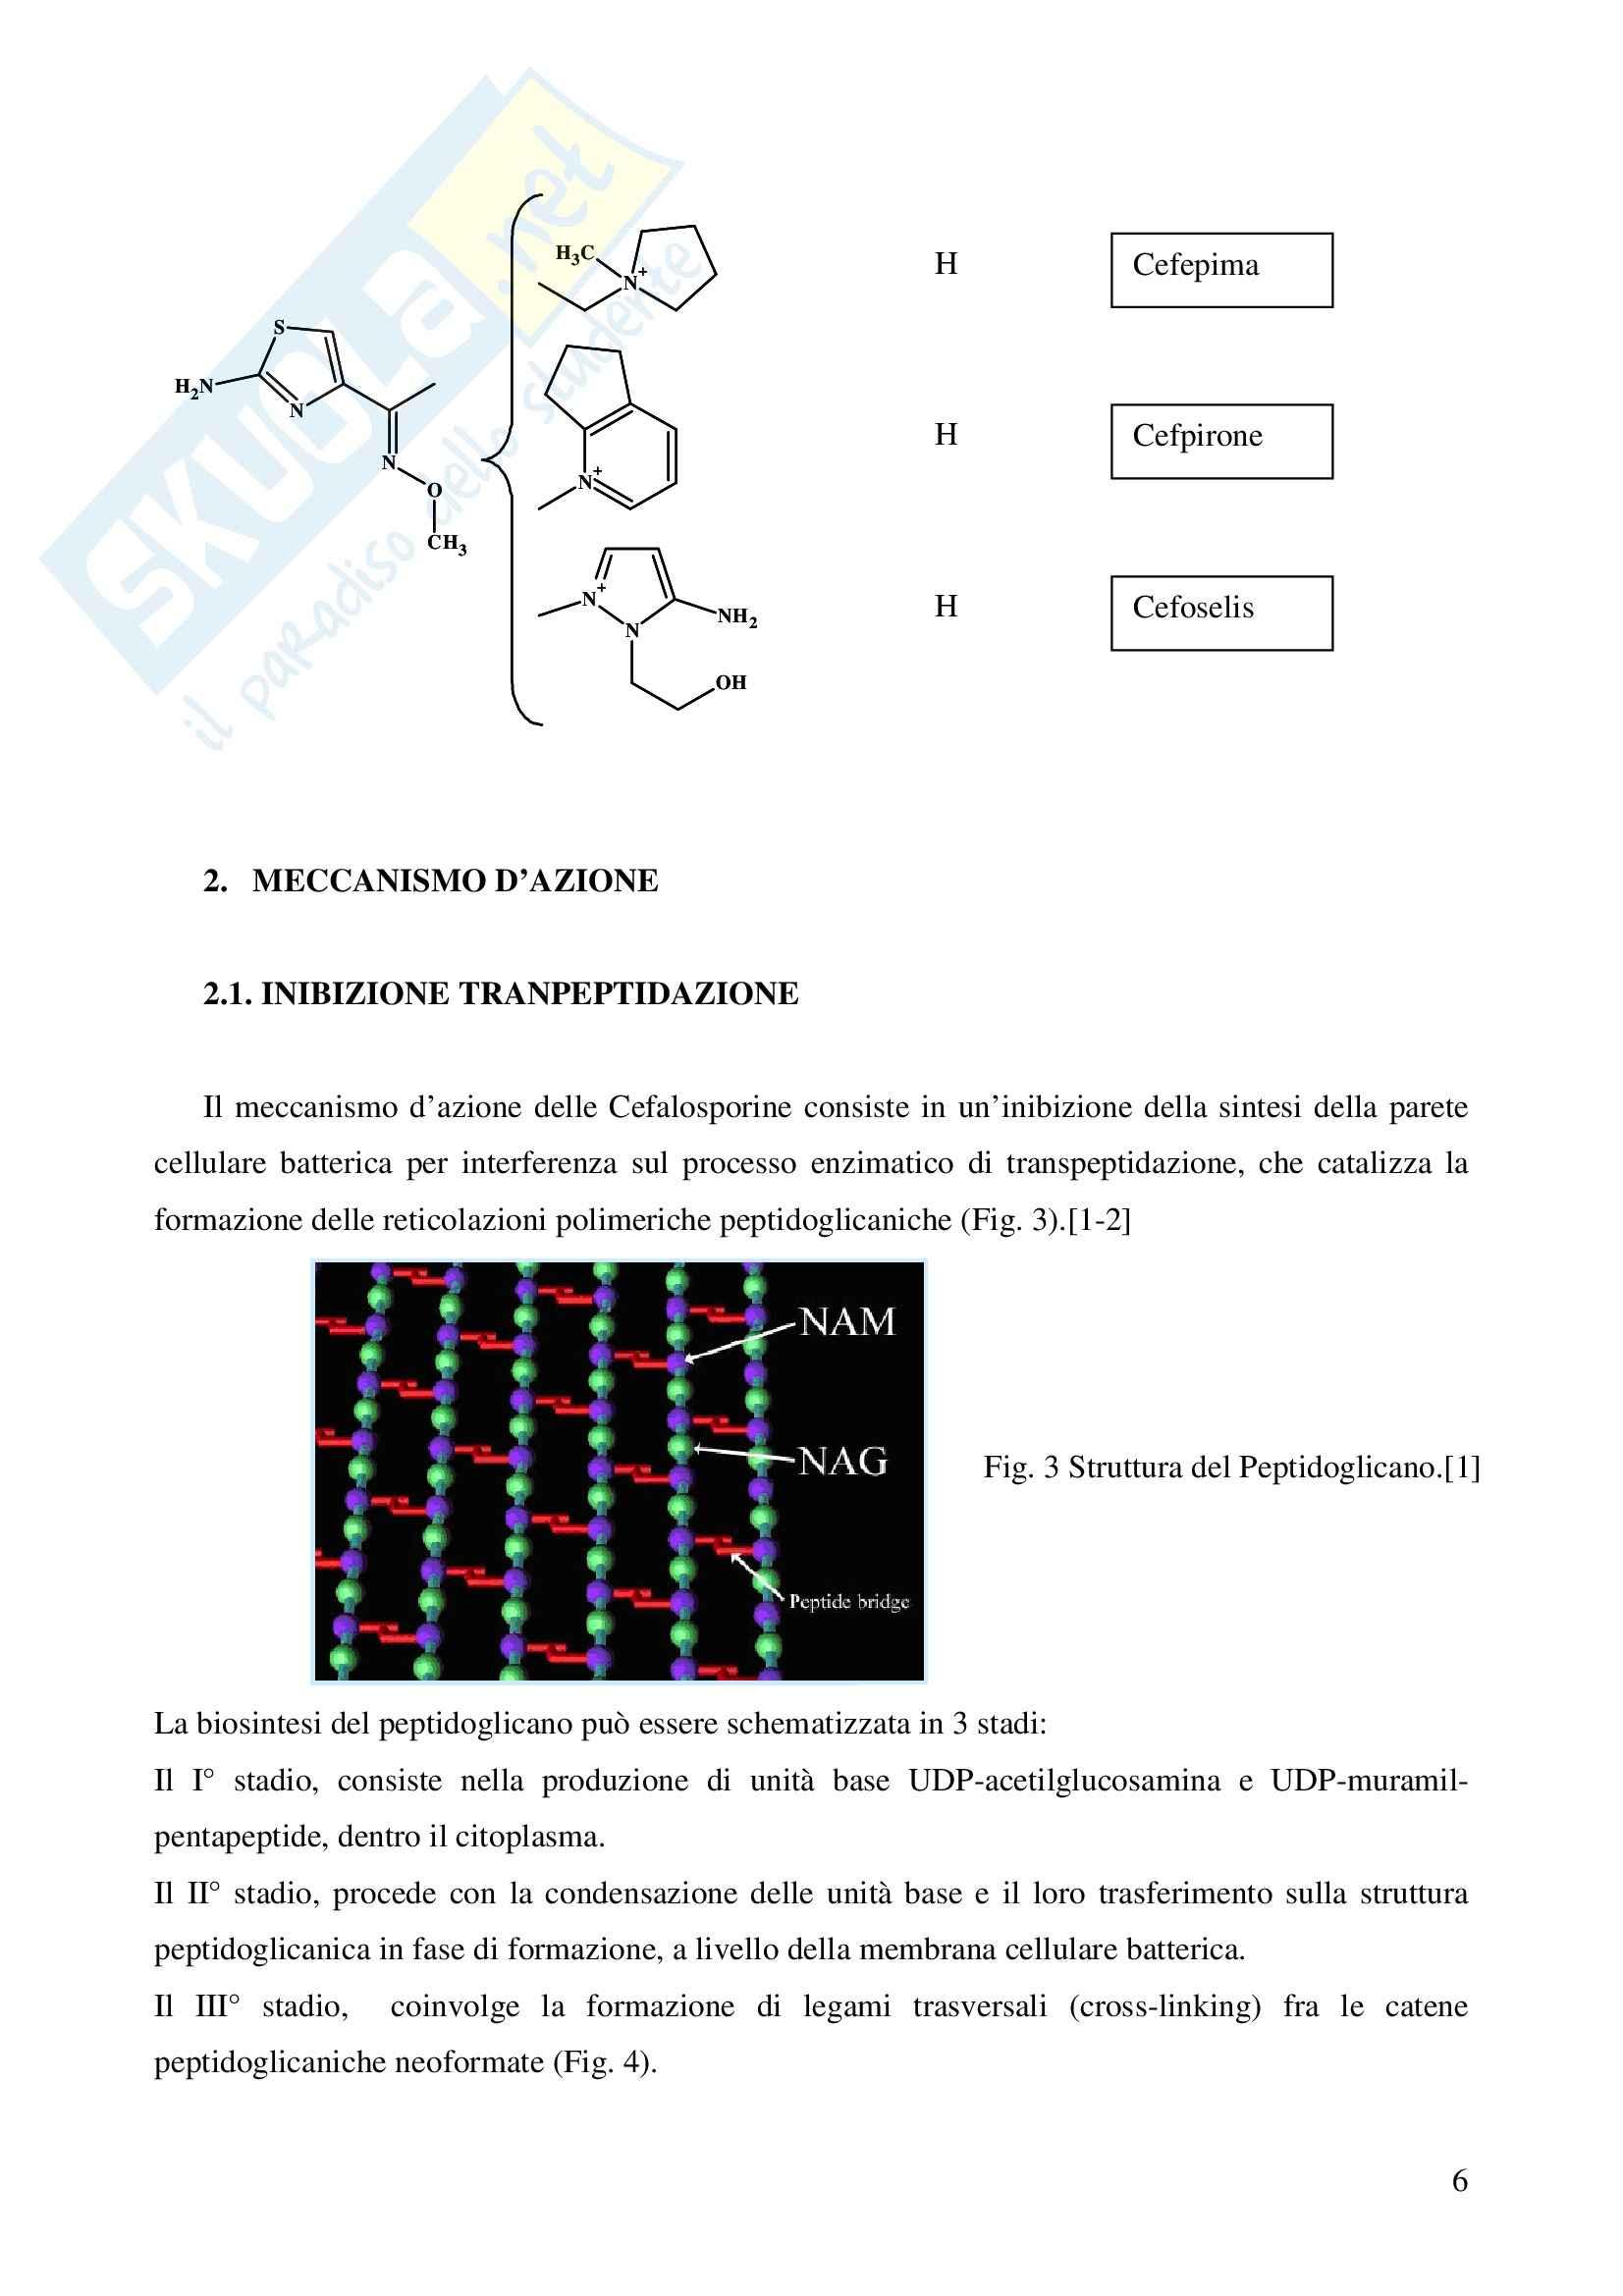 Chimica farmaceutica - le cefalosporine Pag. 6